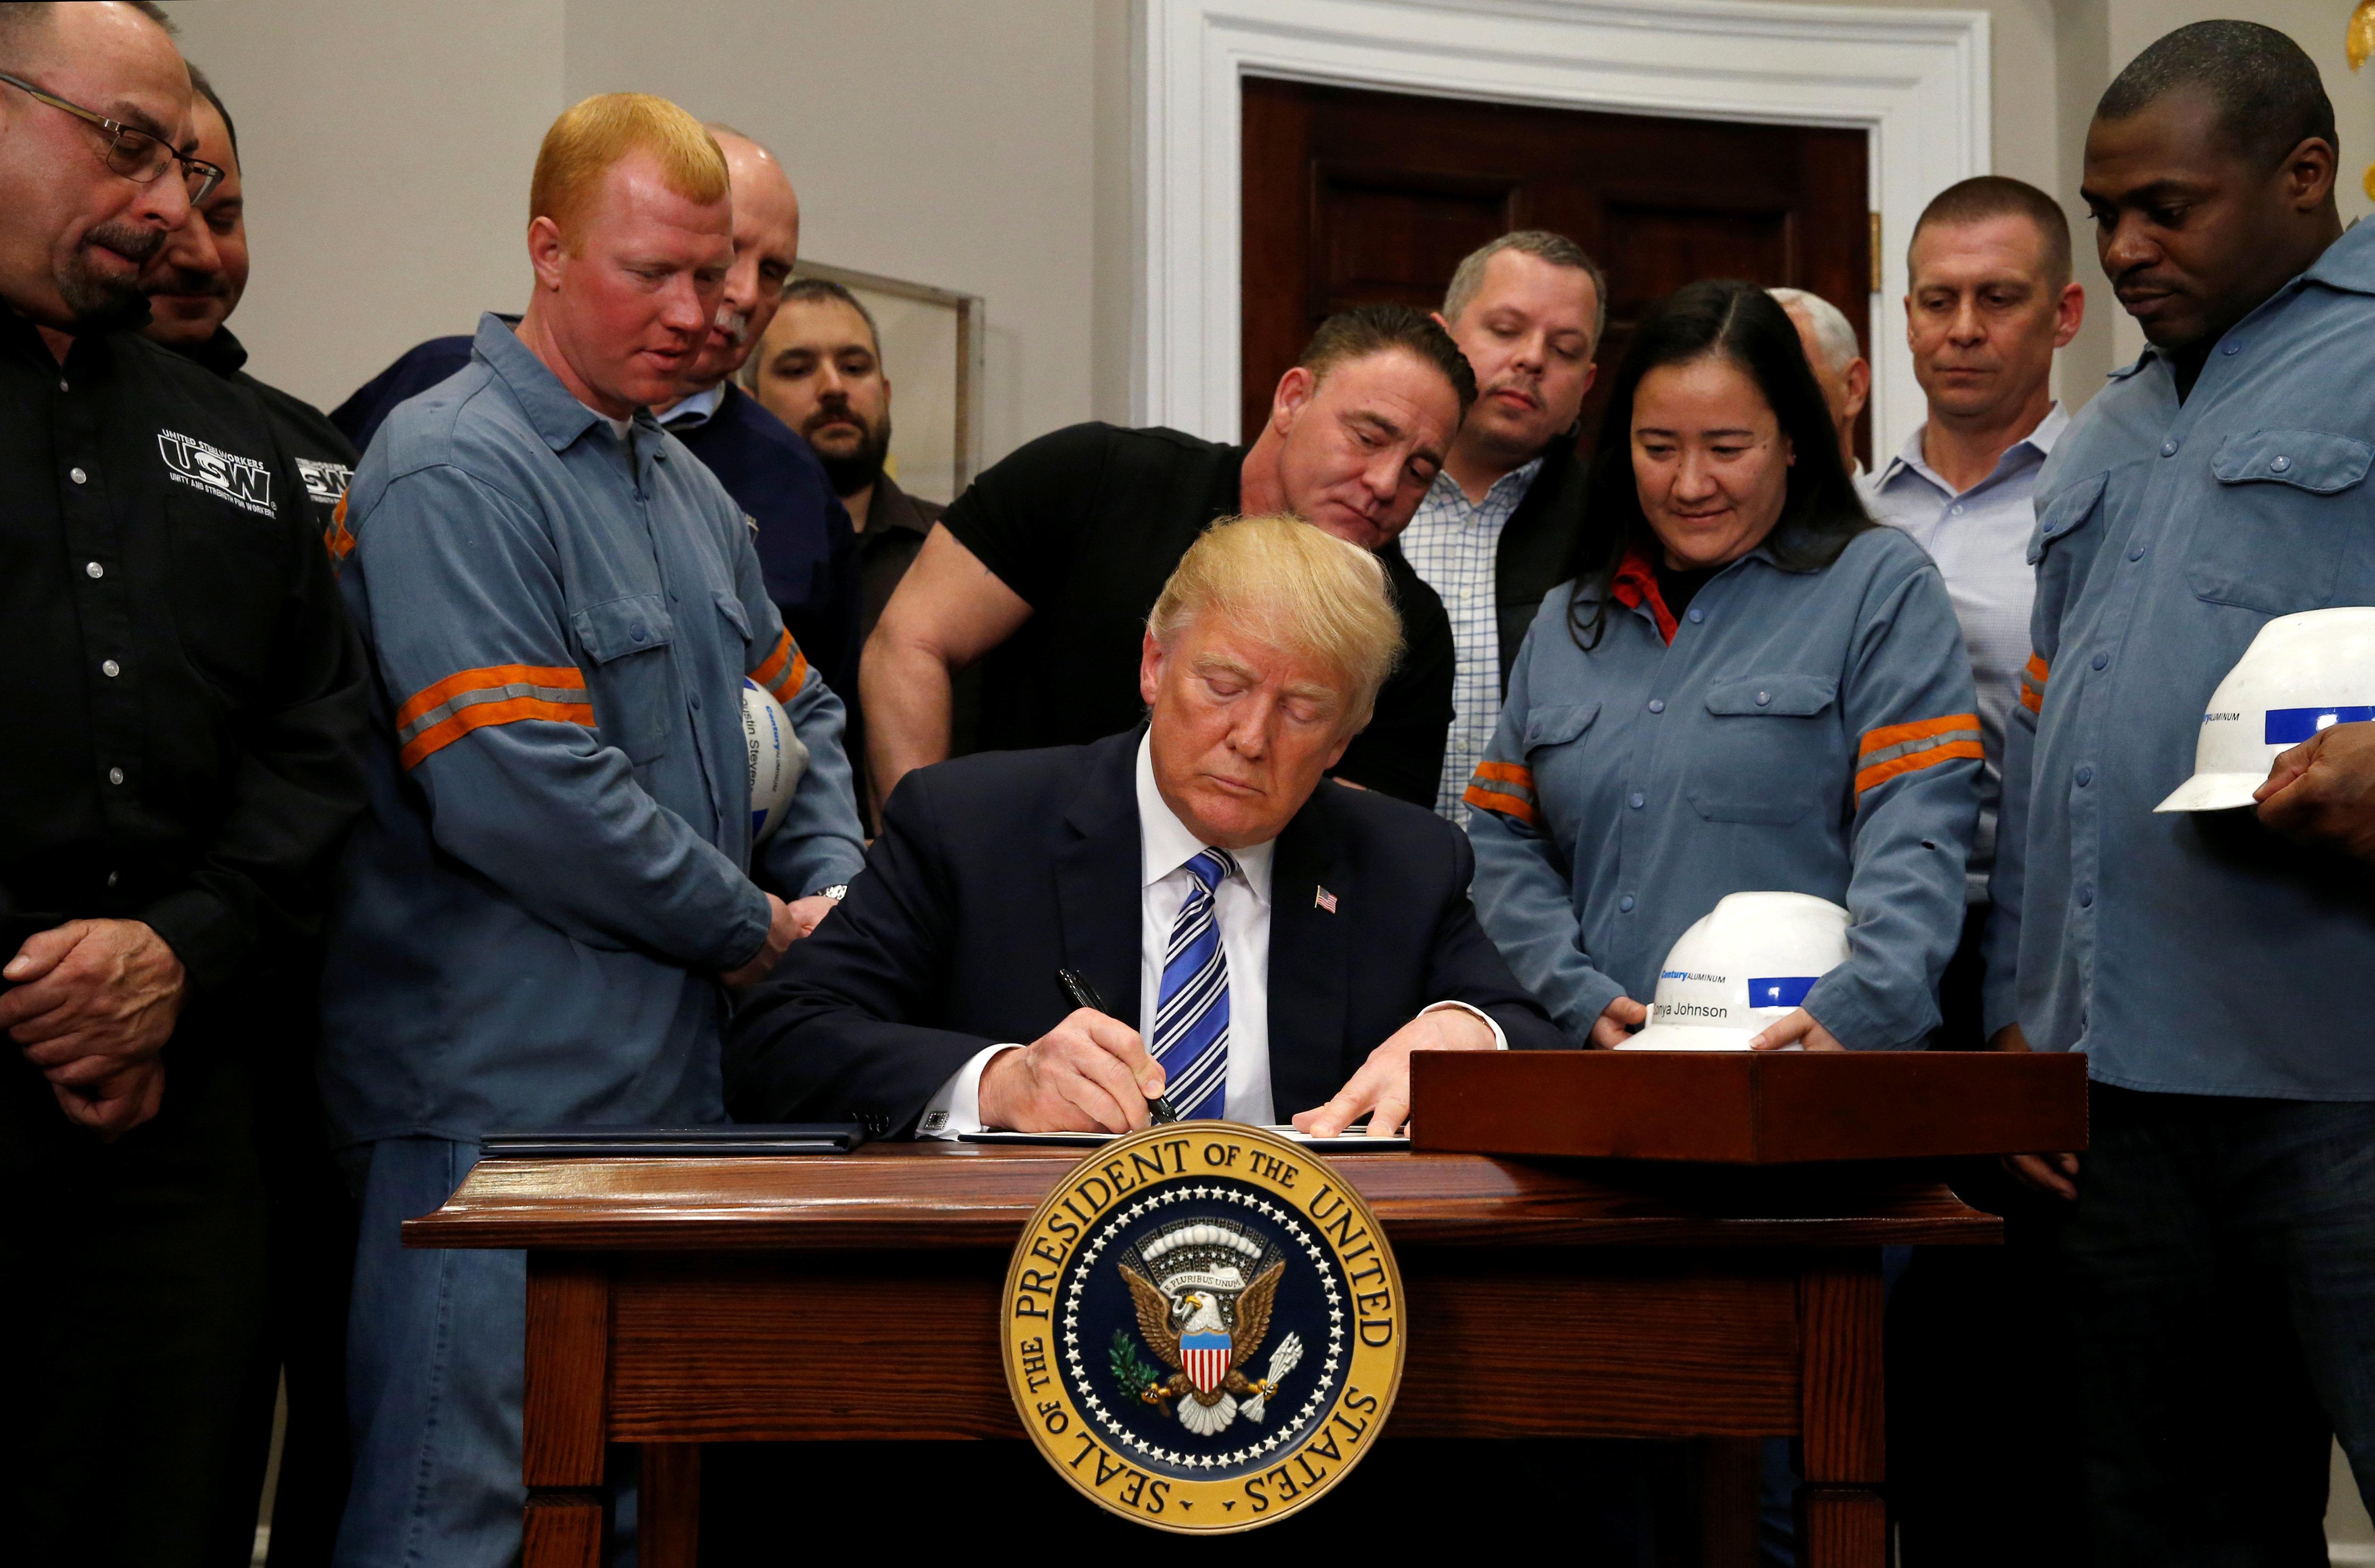 45 U.S. Trade Groups Beg Trump: Don't Impose Tariffs On China